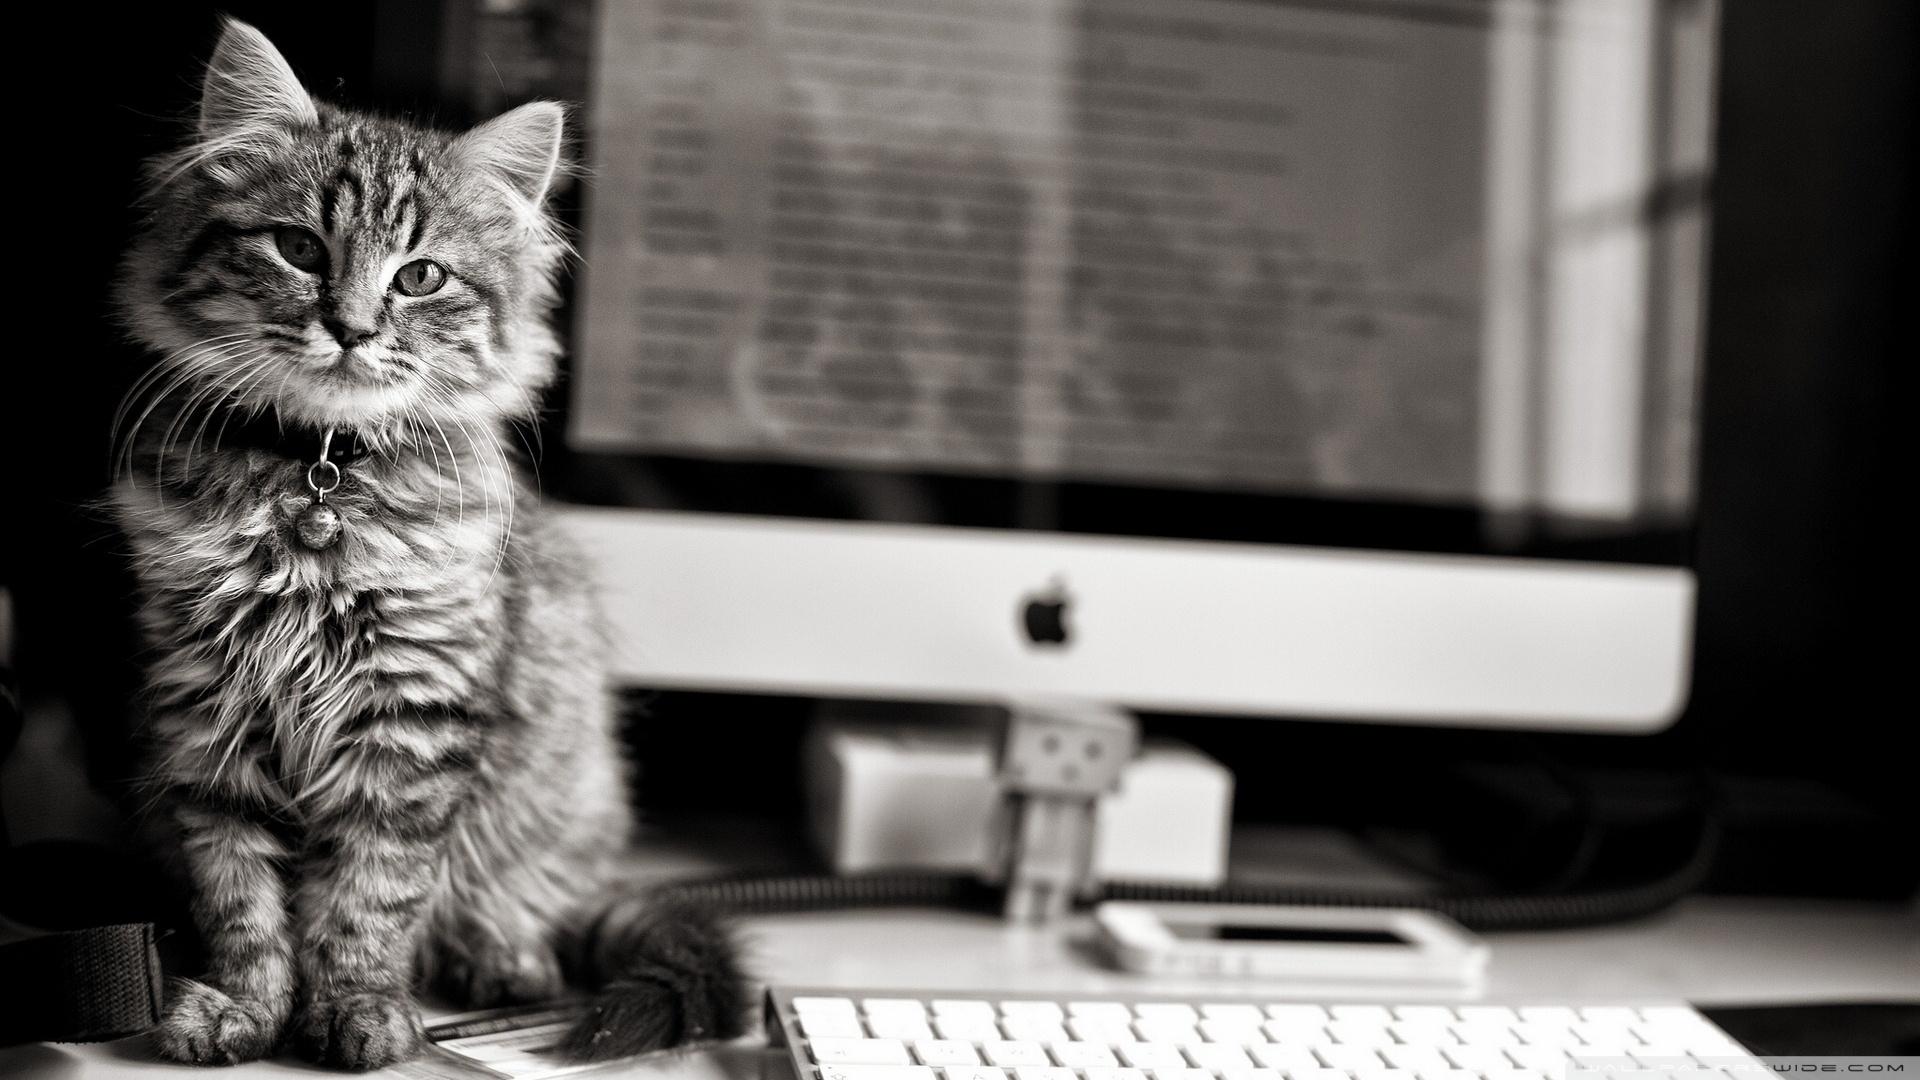 computer cat ❤ 4k hd desktop wallpaper for 4k ultra hd tv • tablet